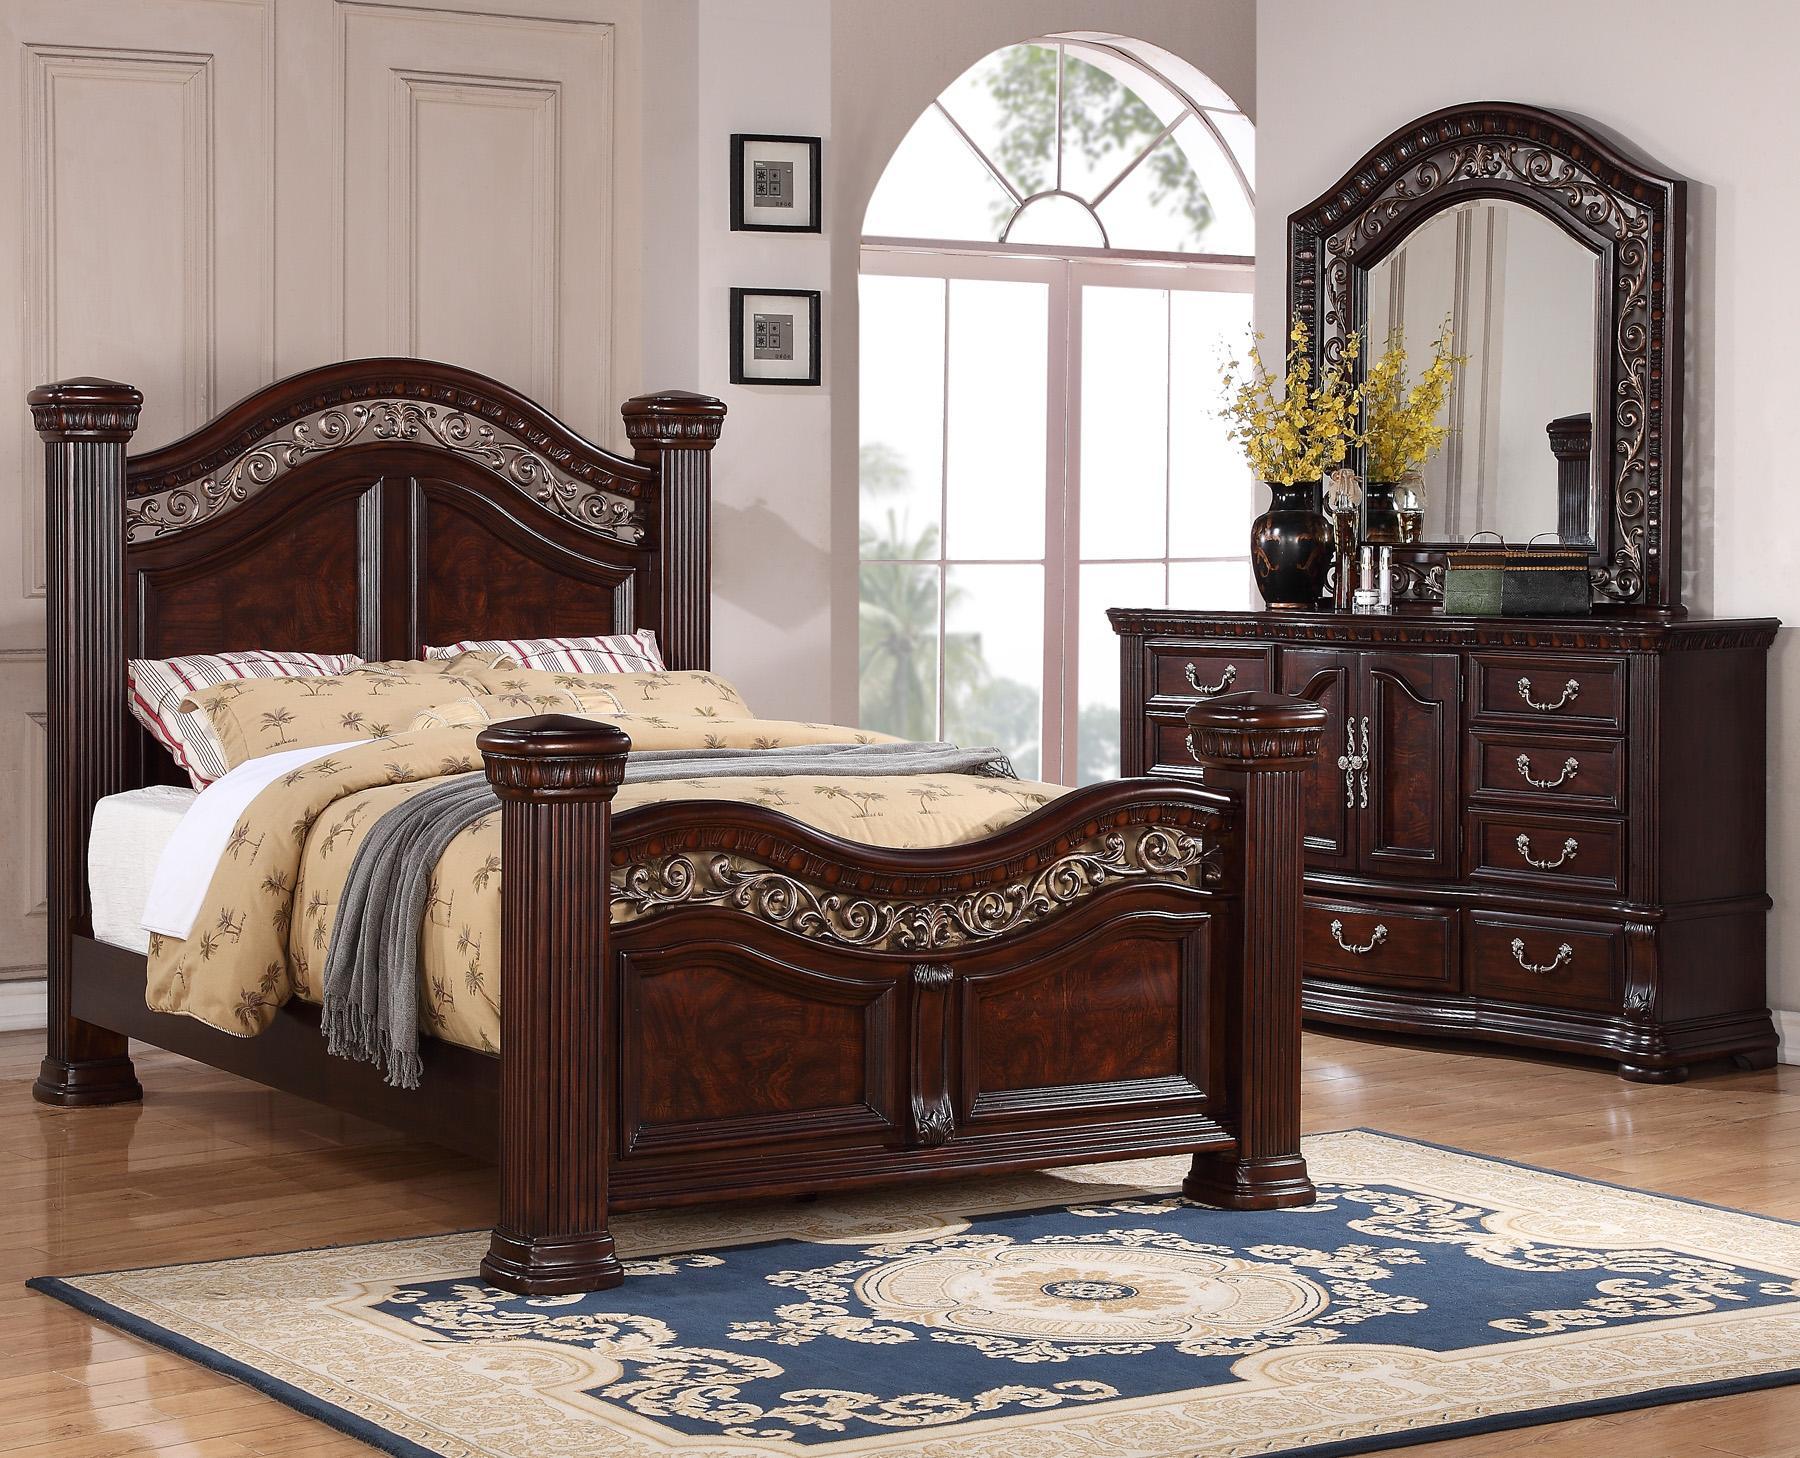 Wynwood alicante bedroom set bedroom design ideas for Wynwood furniture bedroom set cordoba